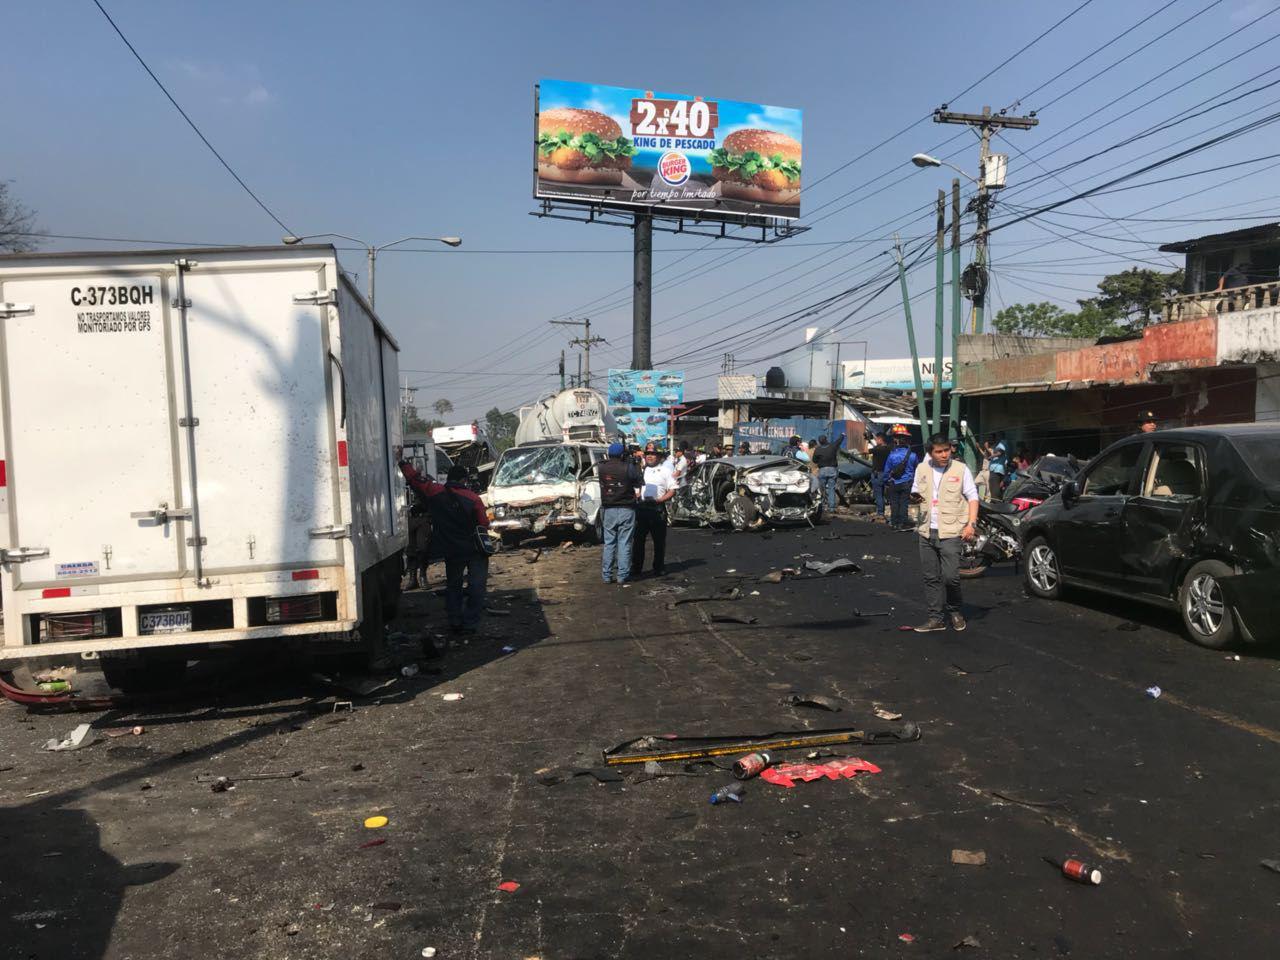 Accidente de tránsito en ruta Interamericana EU Emisoras Unidas Guatemala